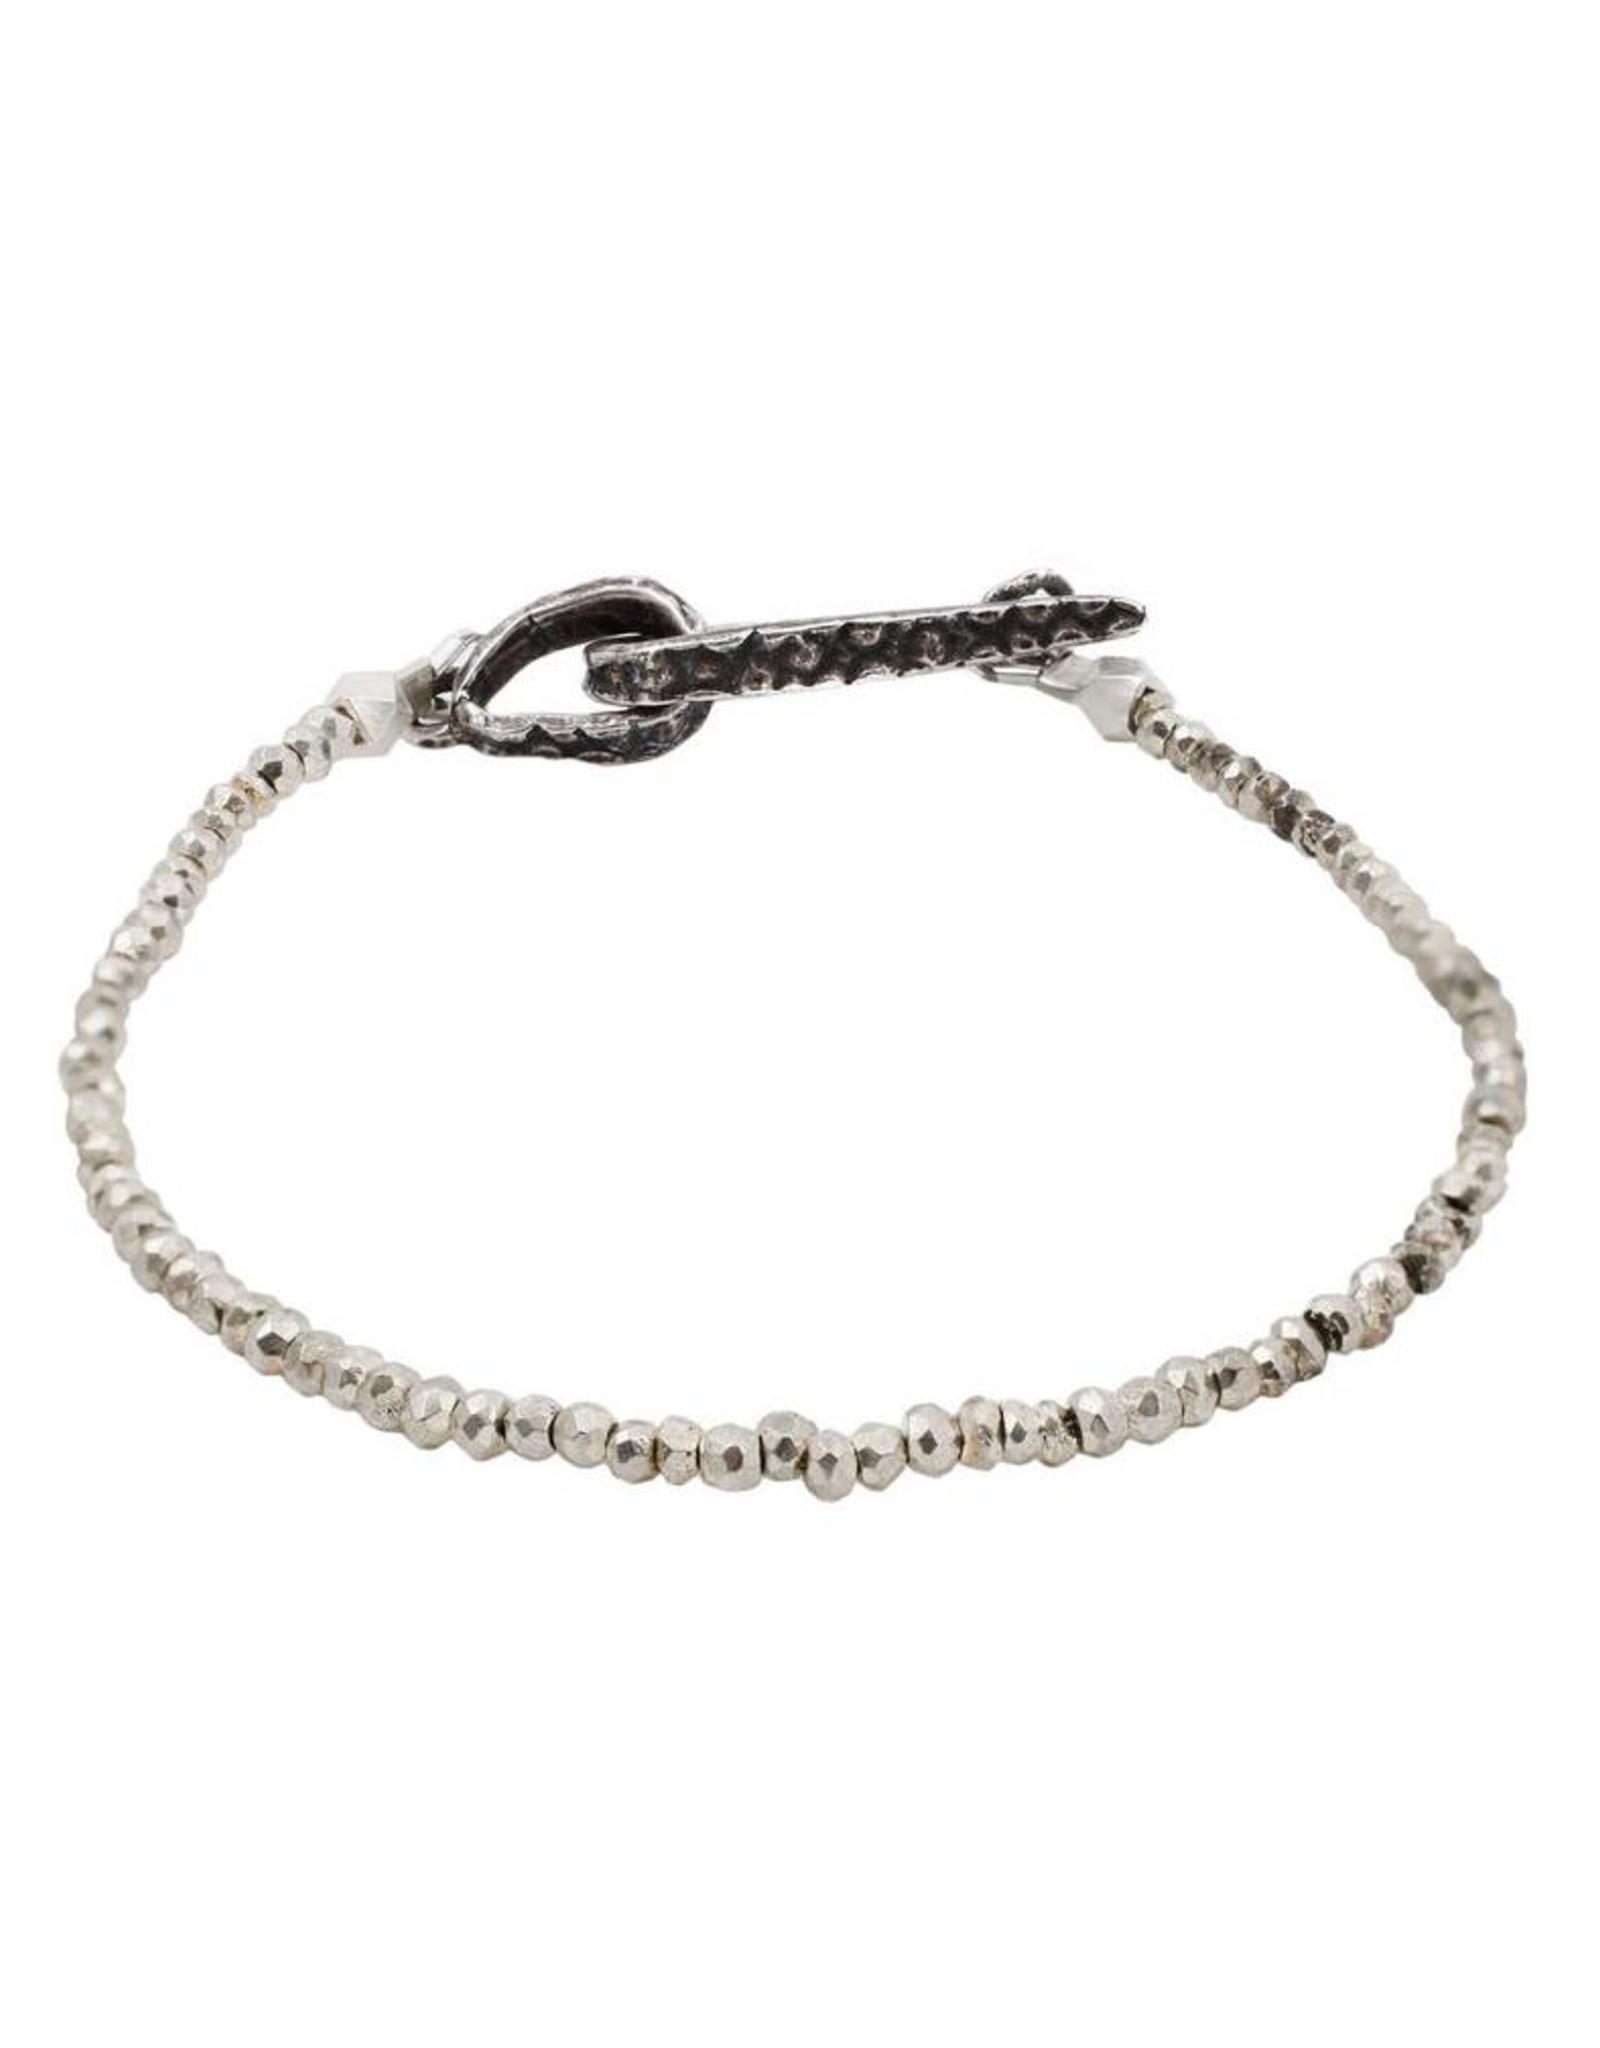 Lauren Wolf Jewelry Strand Bracelet - Silver Pyrite